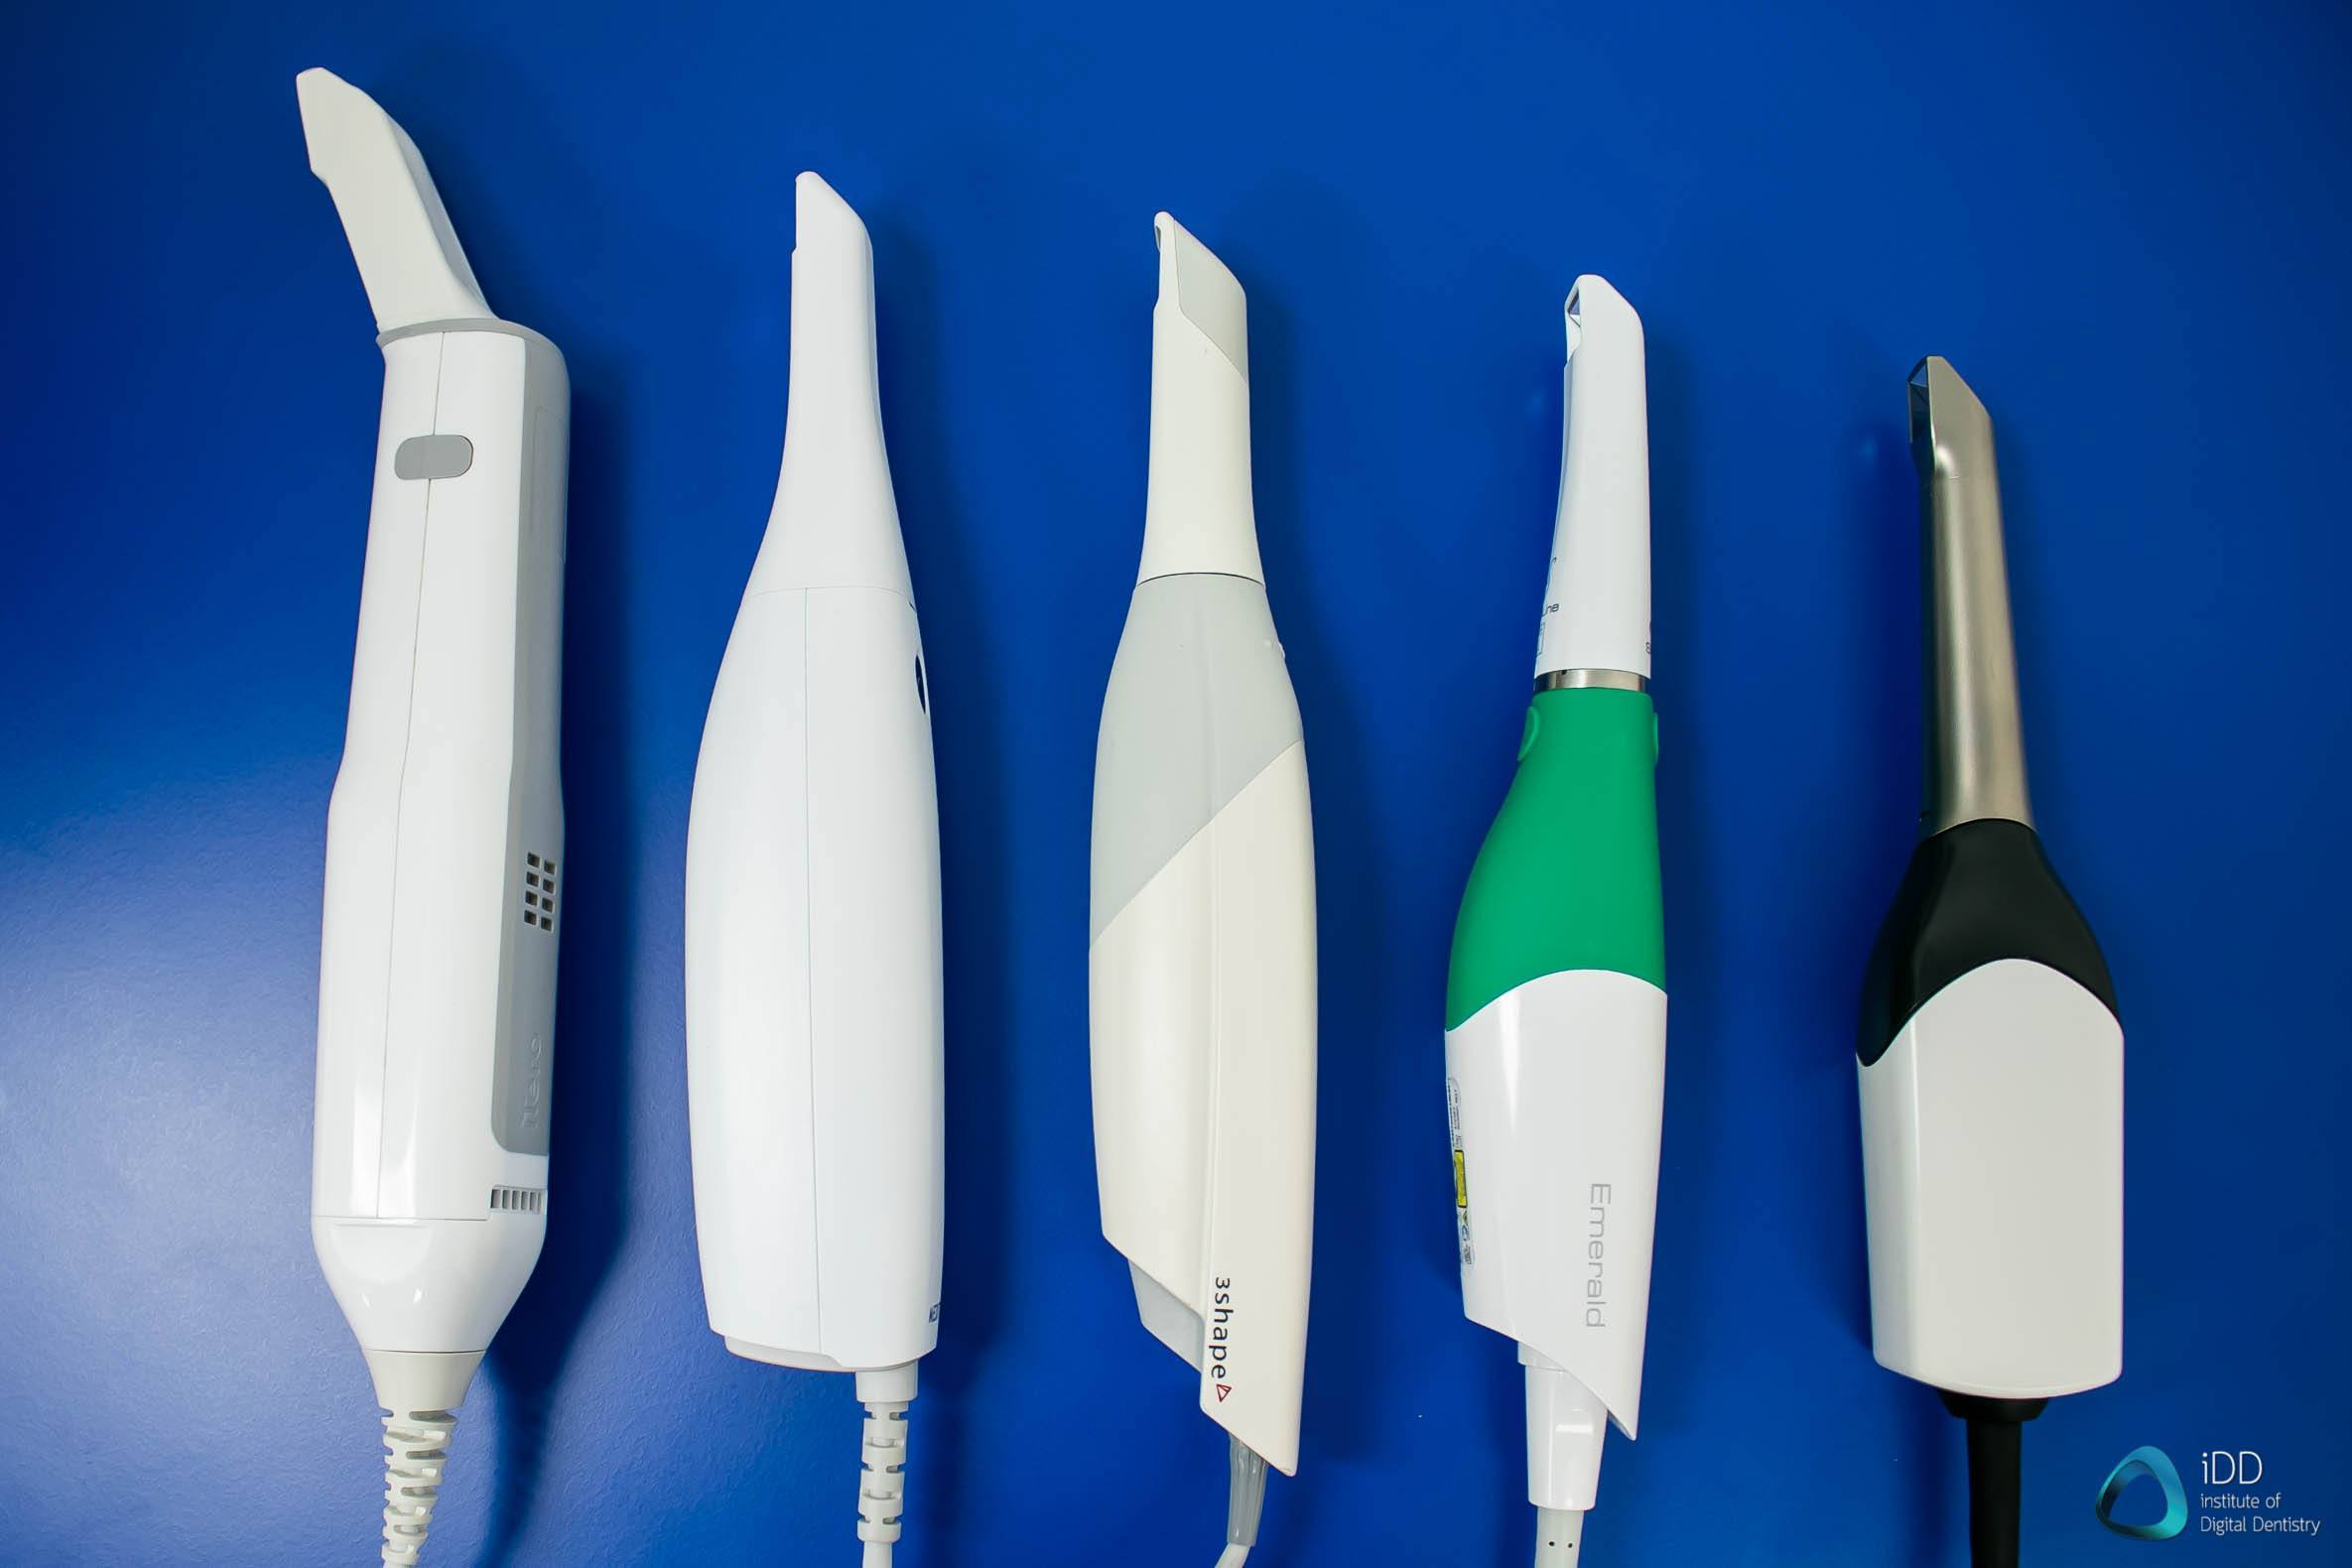 intraoral-scanners-itero-medit-planmeca-cerc